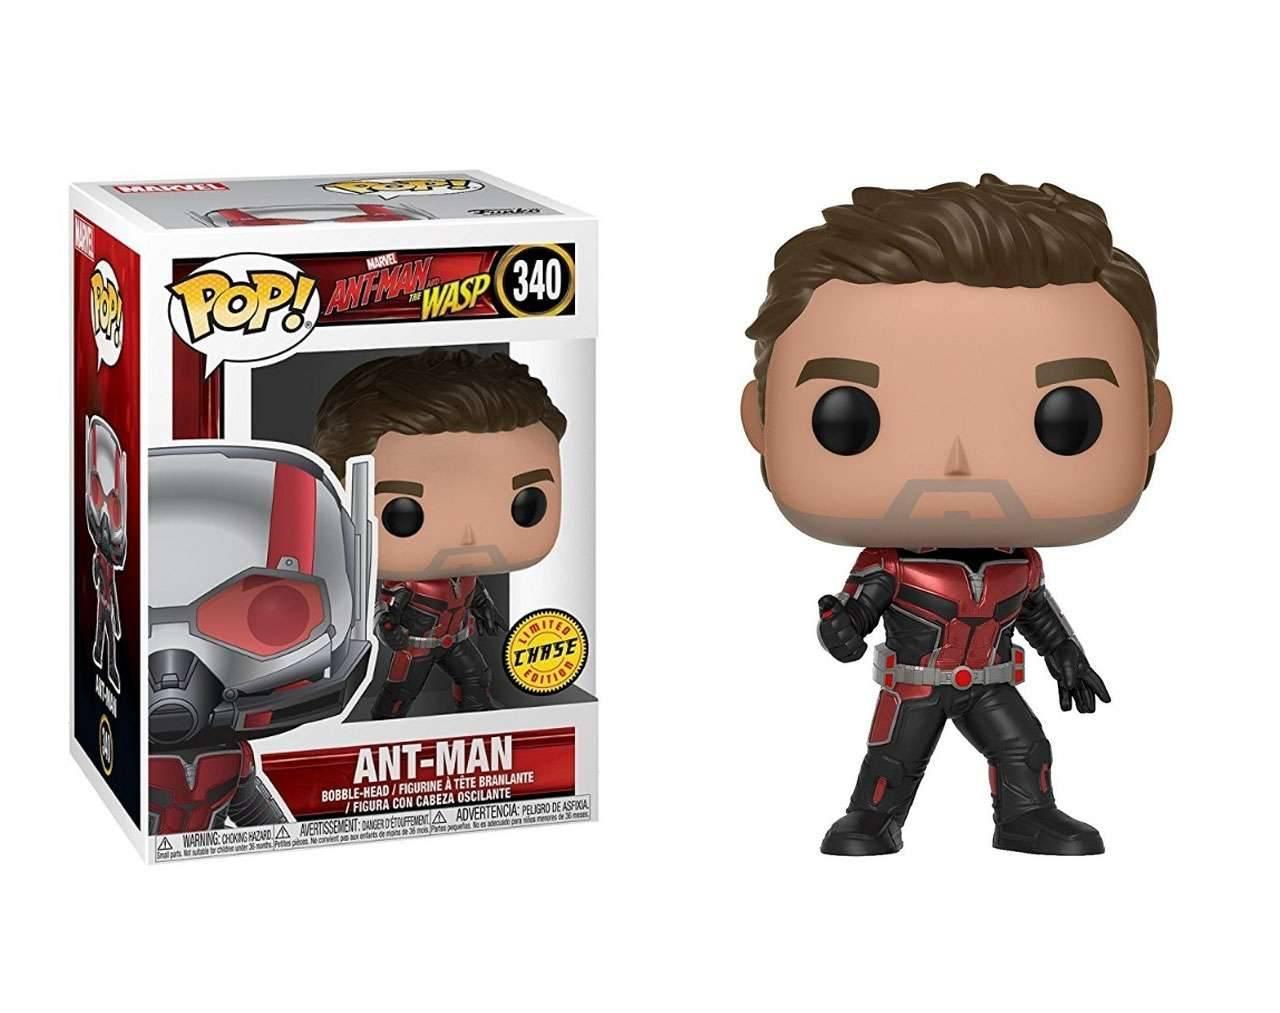 Ant Man (Edición Chase) Pop! Vinyl